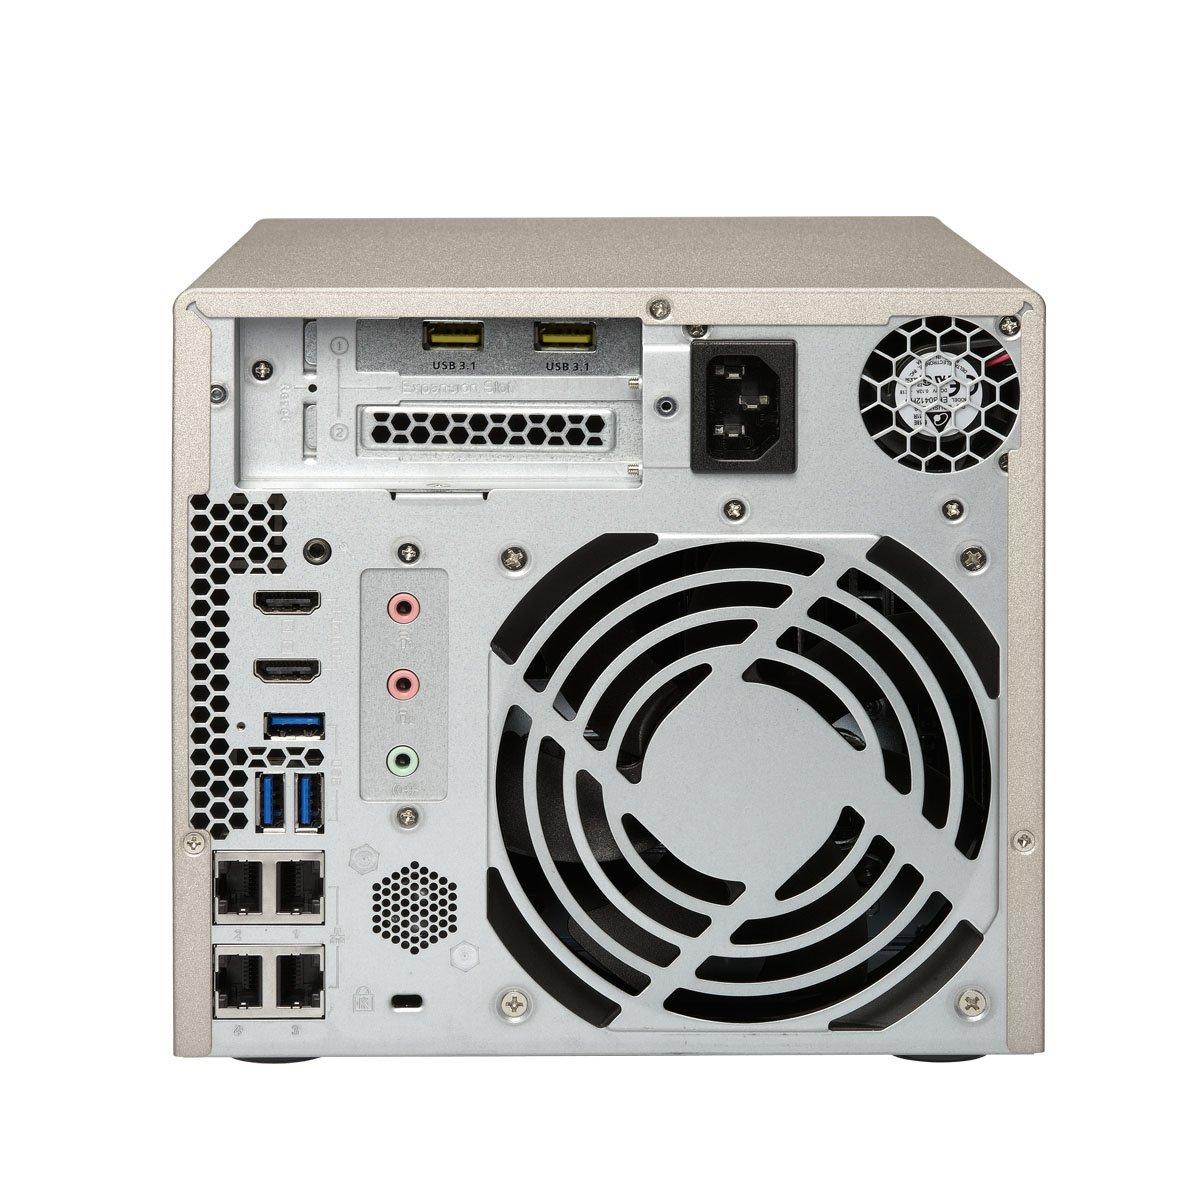 Qnap TVS-473-8G-US 4-bay NAS/iSCSI IP-SAN, AMD R series Quad-core 2.1GHz, 8GB RAM, 10G-ready by QNAP (Image #4)